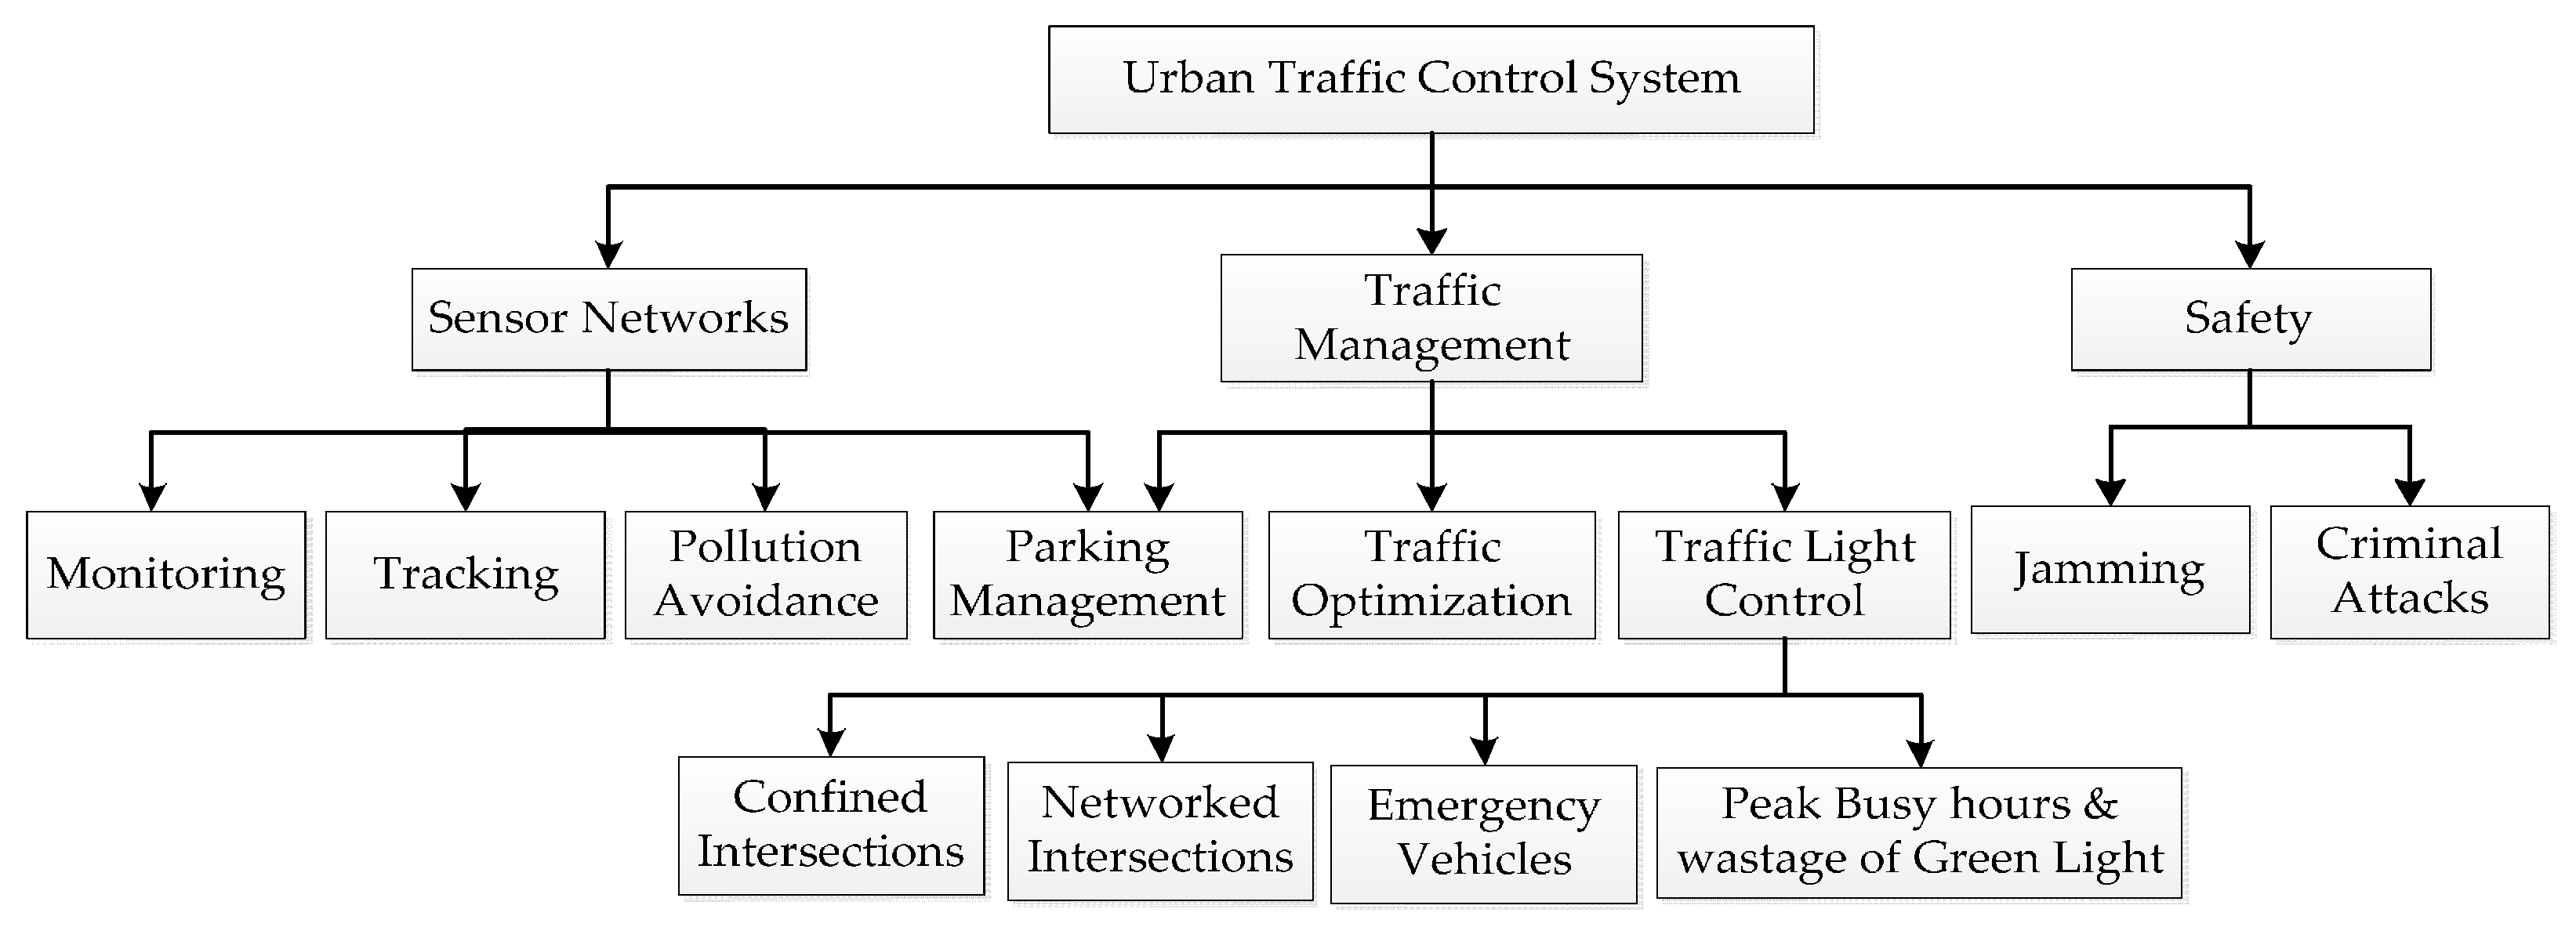 Sensors | Free Full-Text | A Survey on Urban Traffic Management